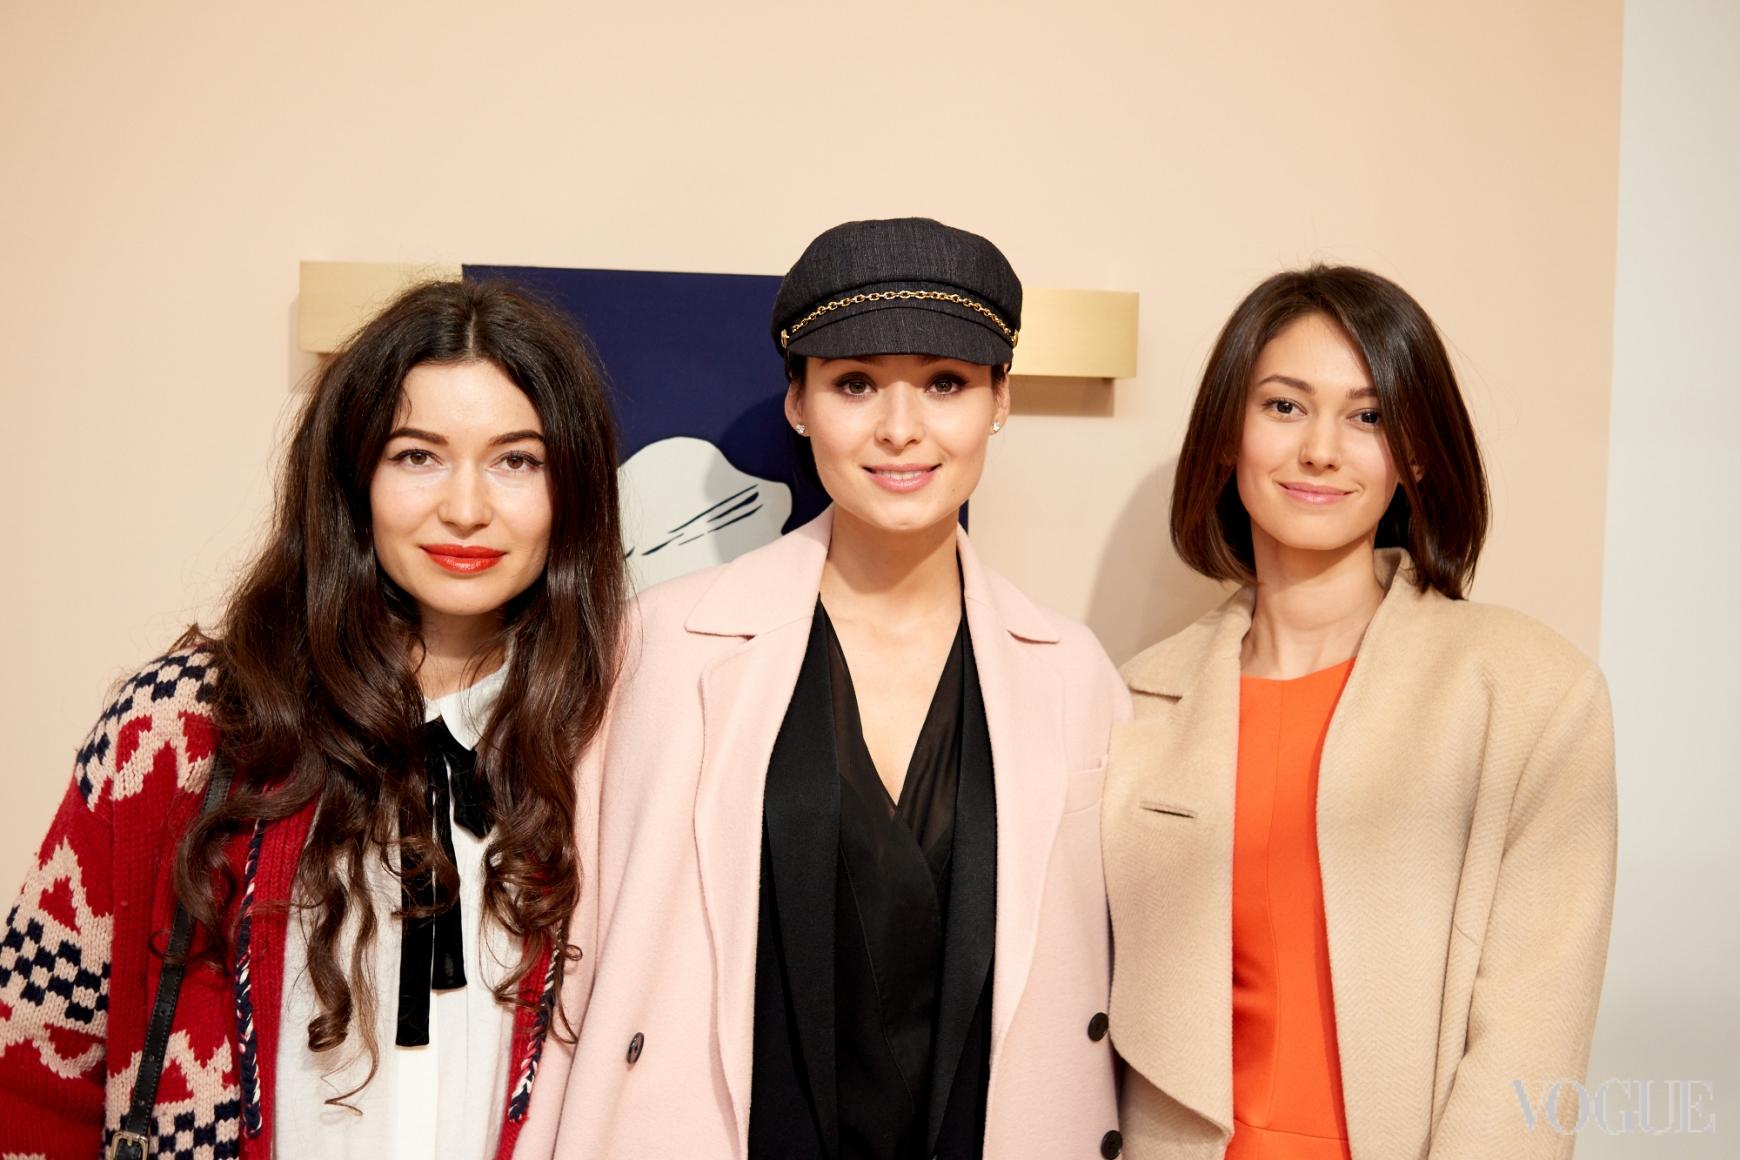 Александра Червоненко, Зоя Литвин и Катерина Горина